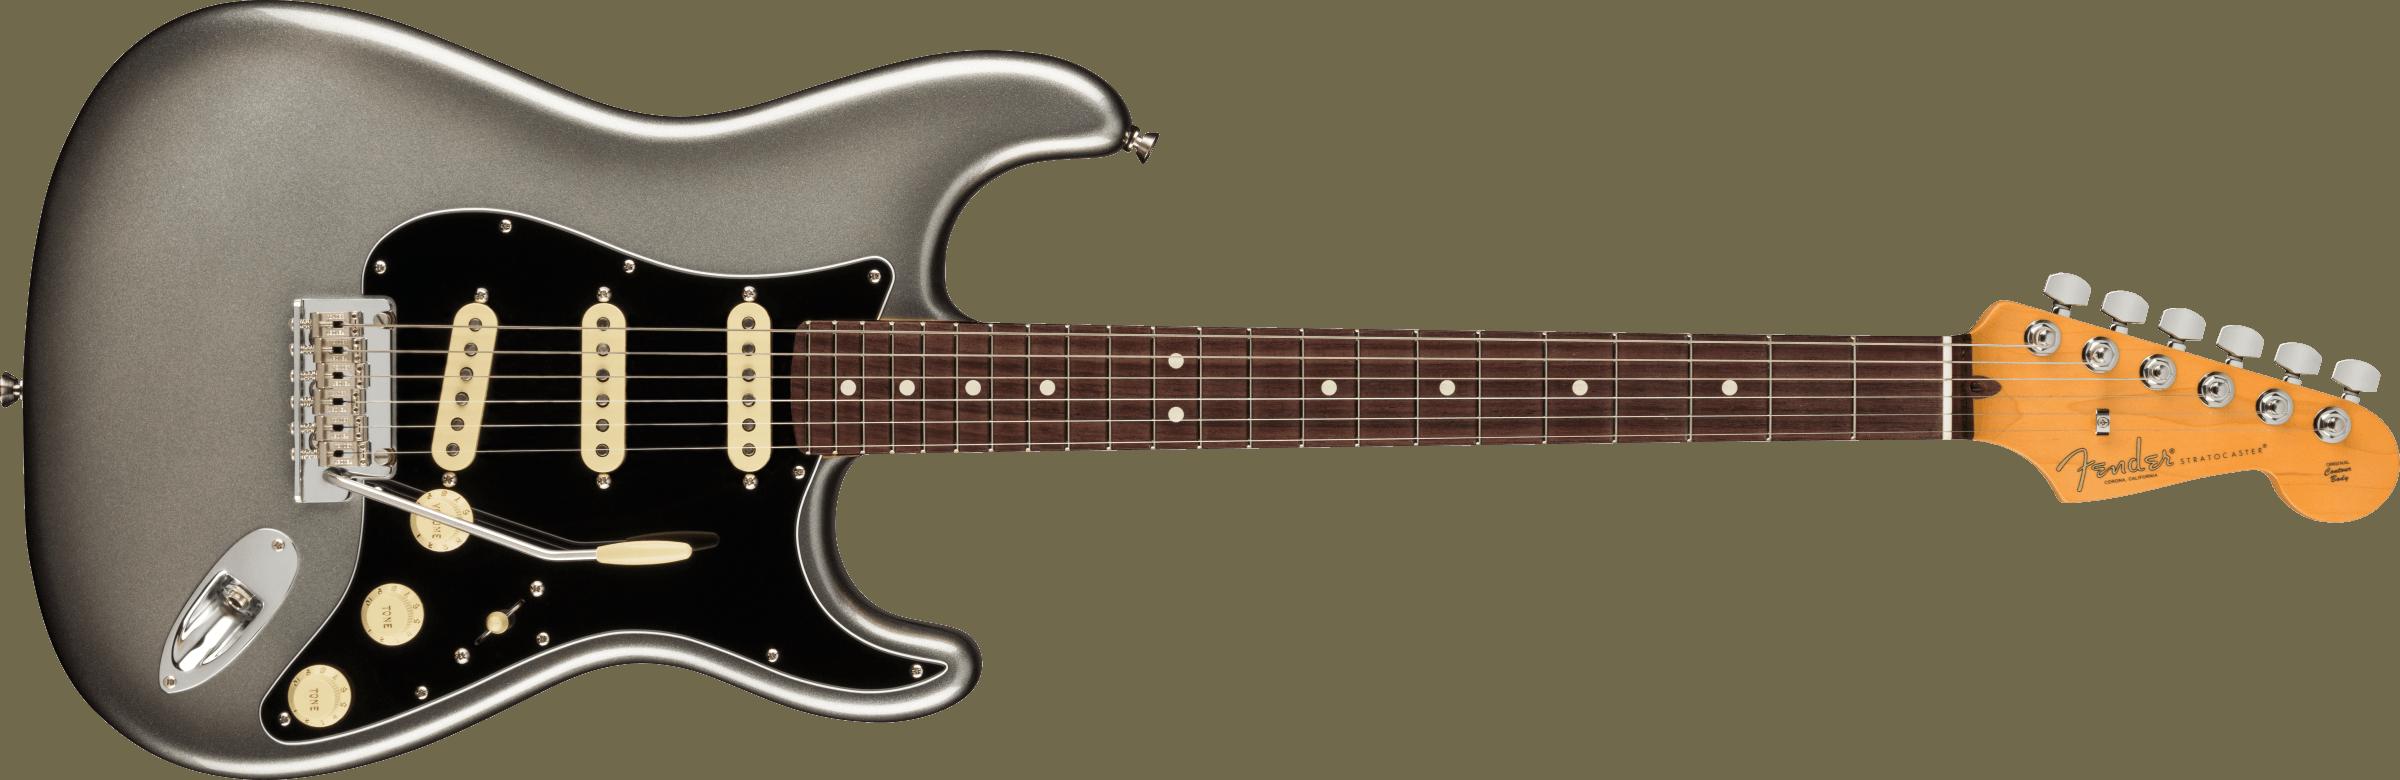 FENDER-American-Professional-II-Stratocaster-Rosewood-Fingerboard-Mercury-sku-571005517